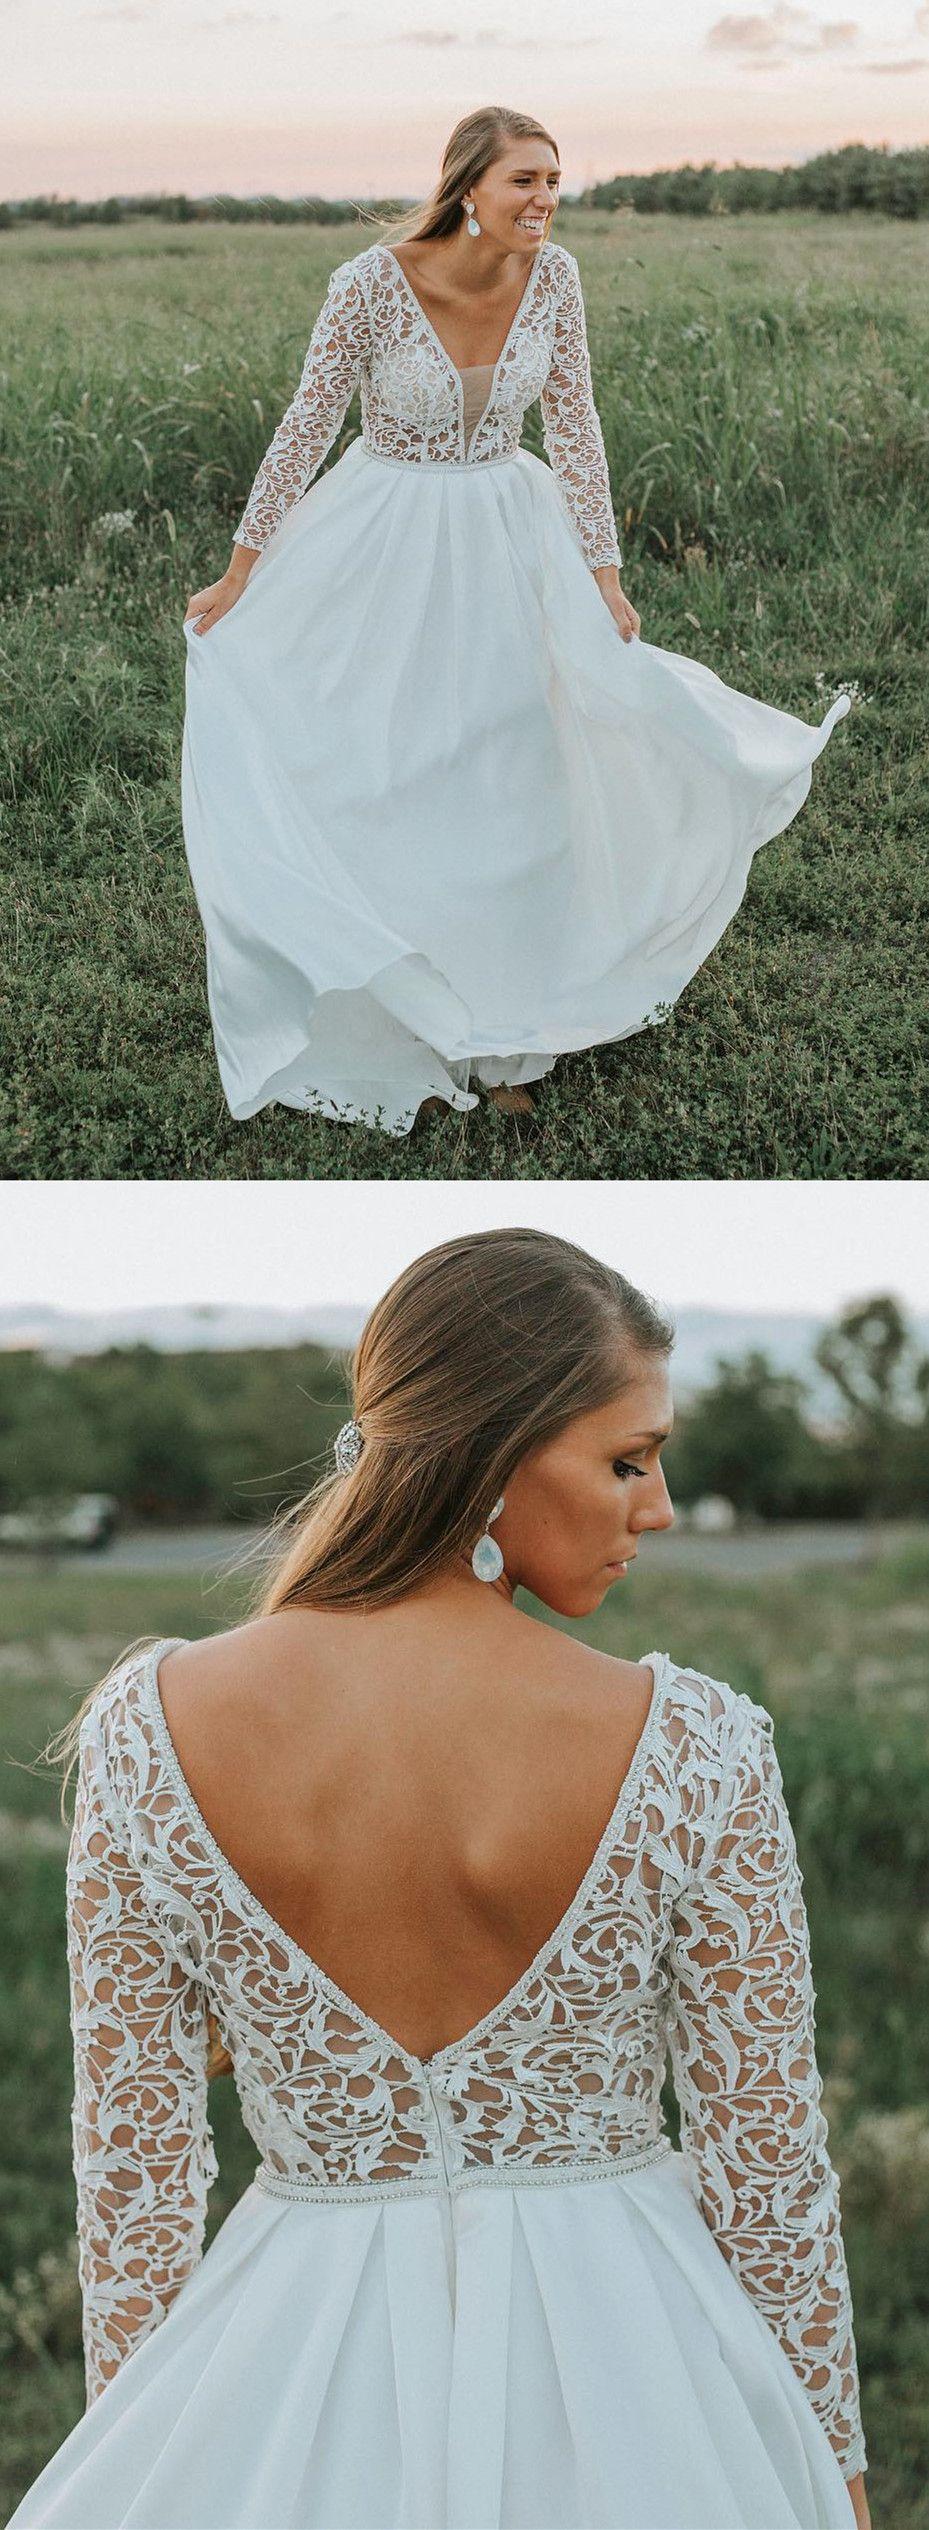 Long sleeves white long wedding dress from modsele prom dresses